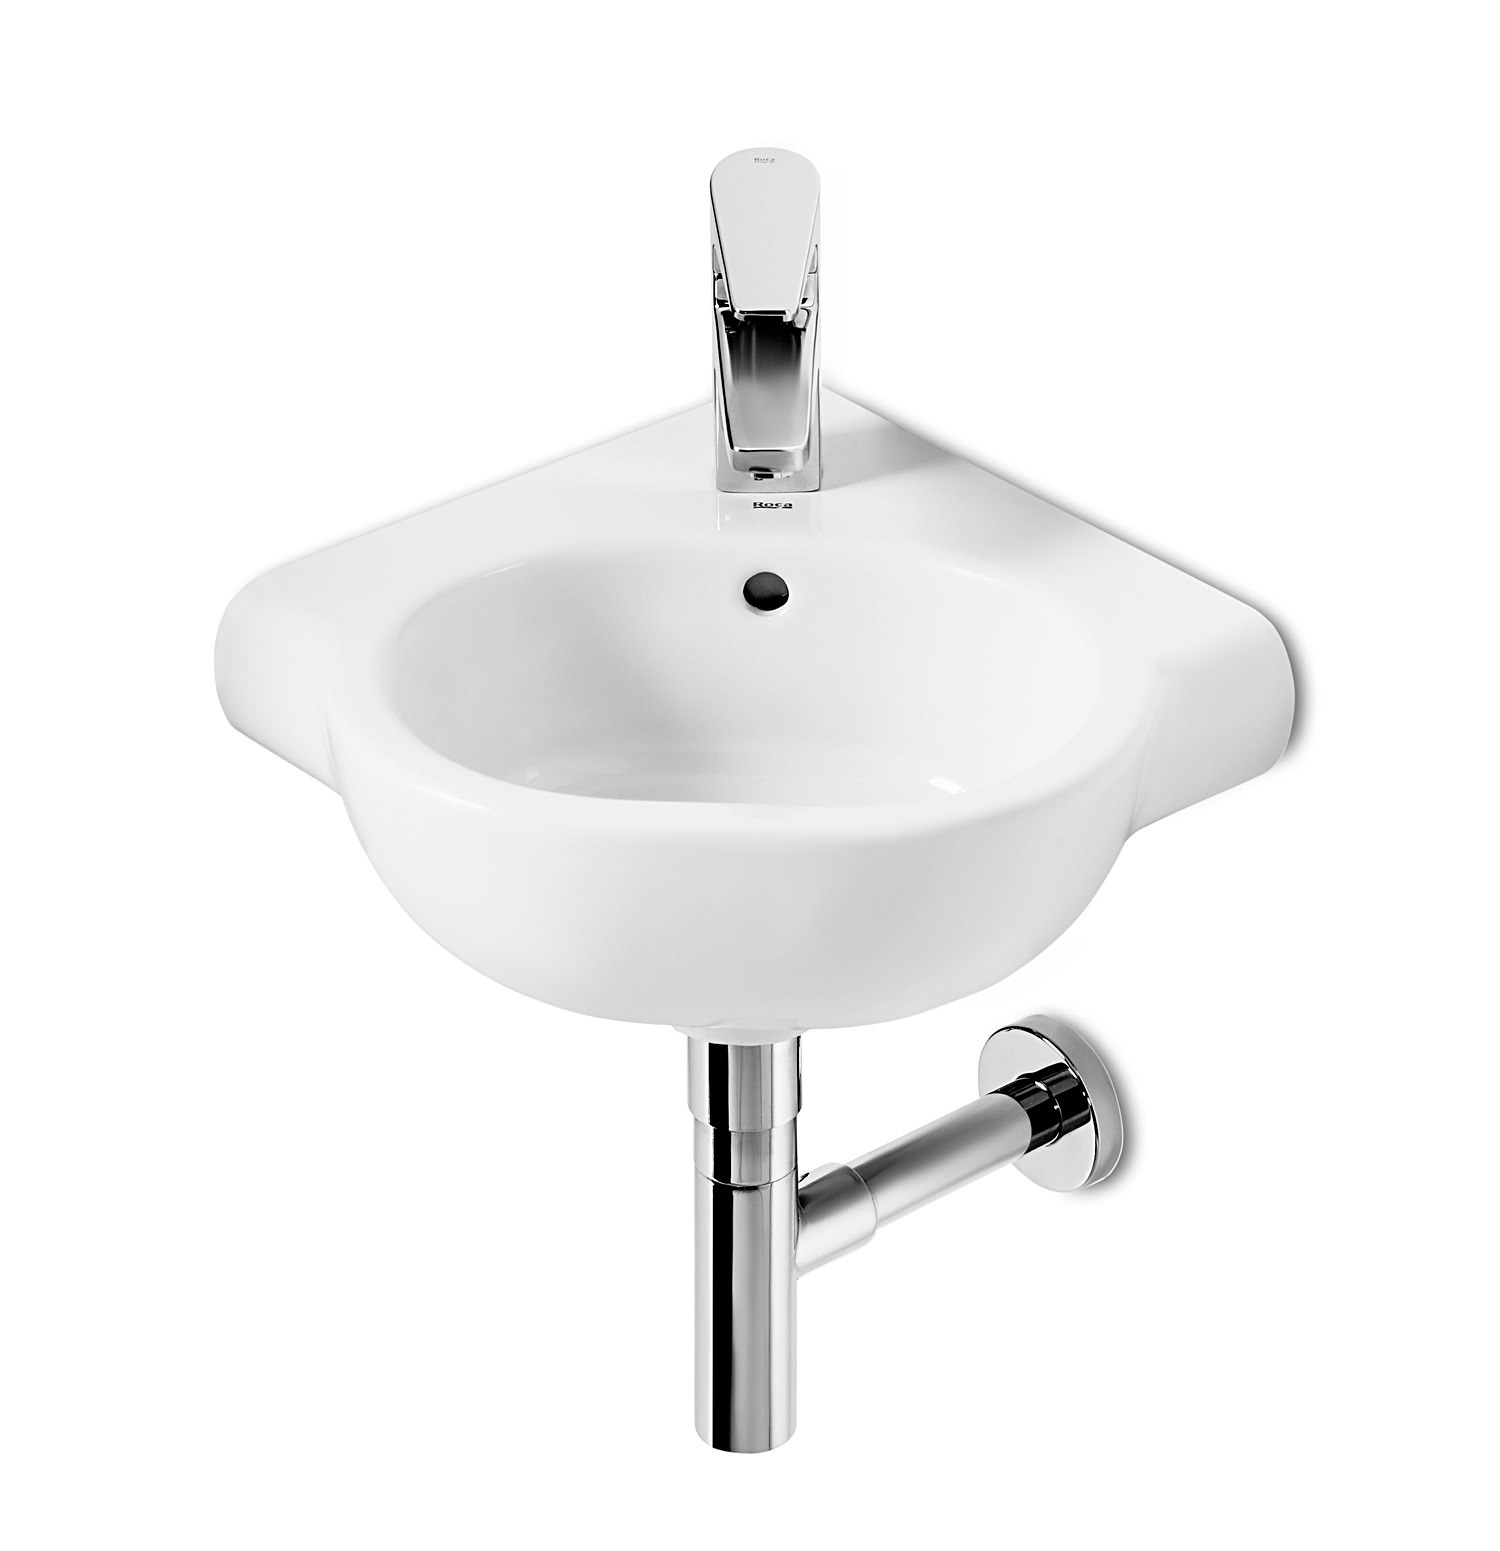 Compact Corner Basin : ... basins corner basins roca meridian n compact corner basin 350mm wide